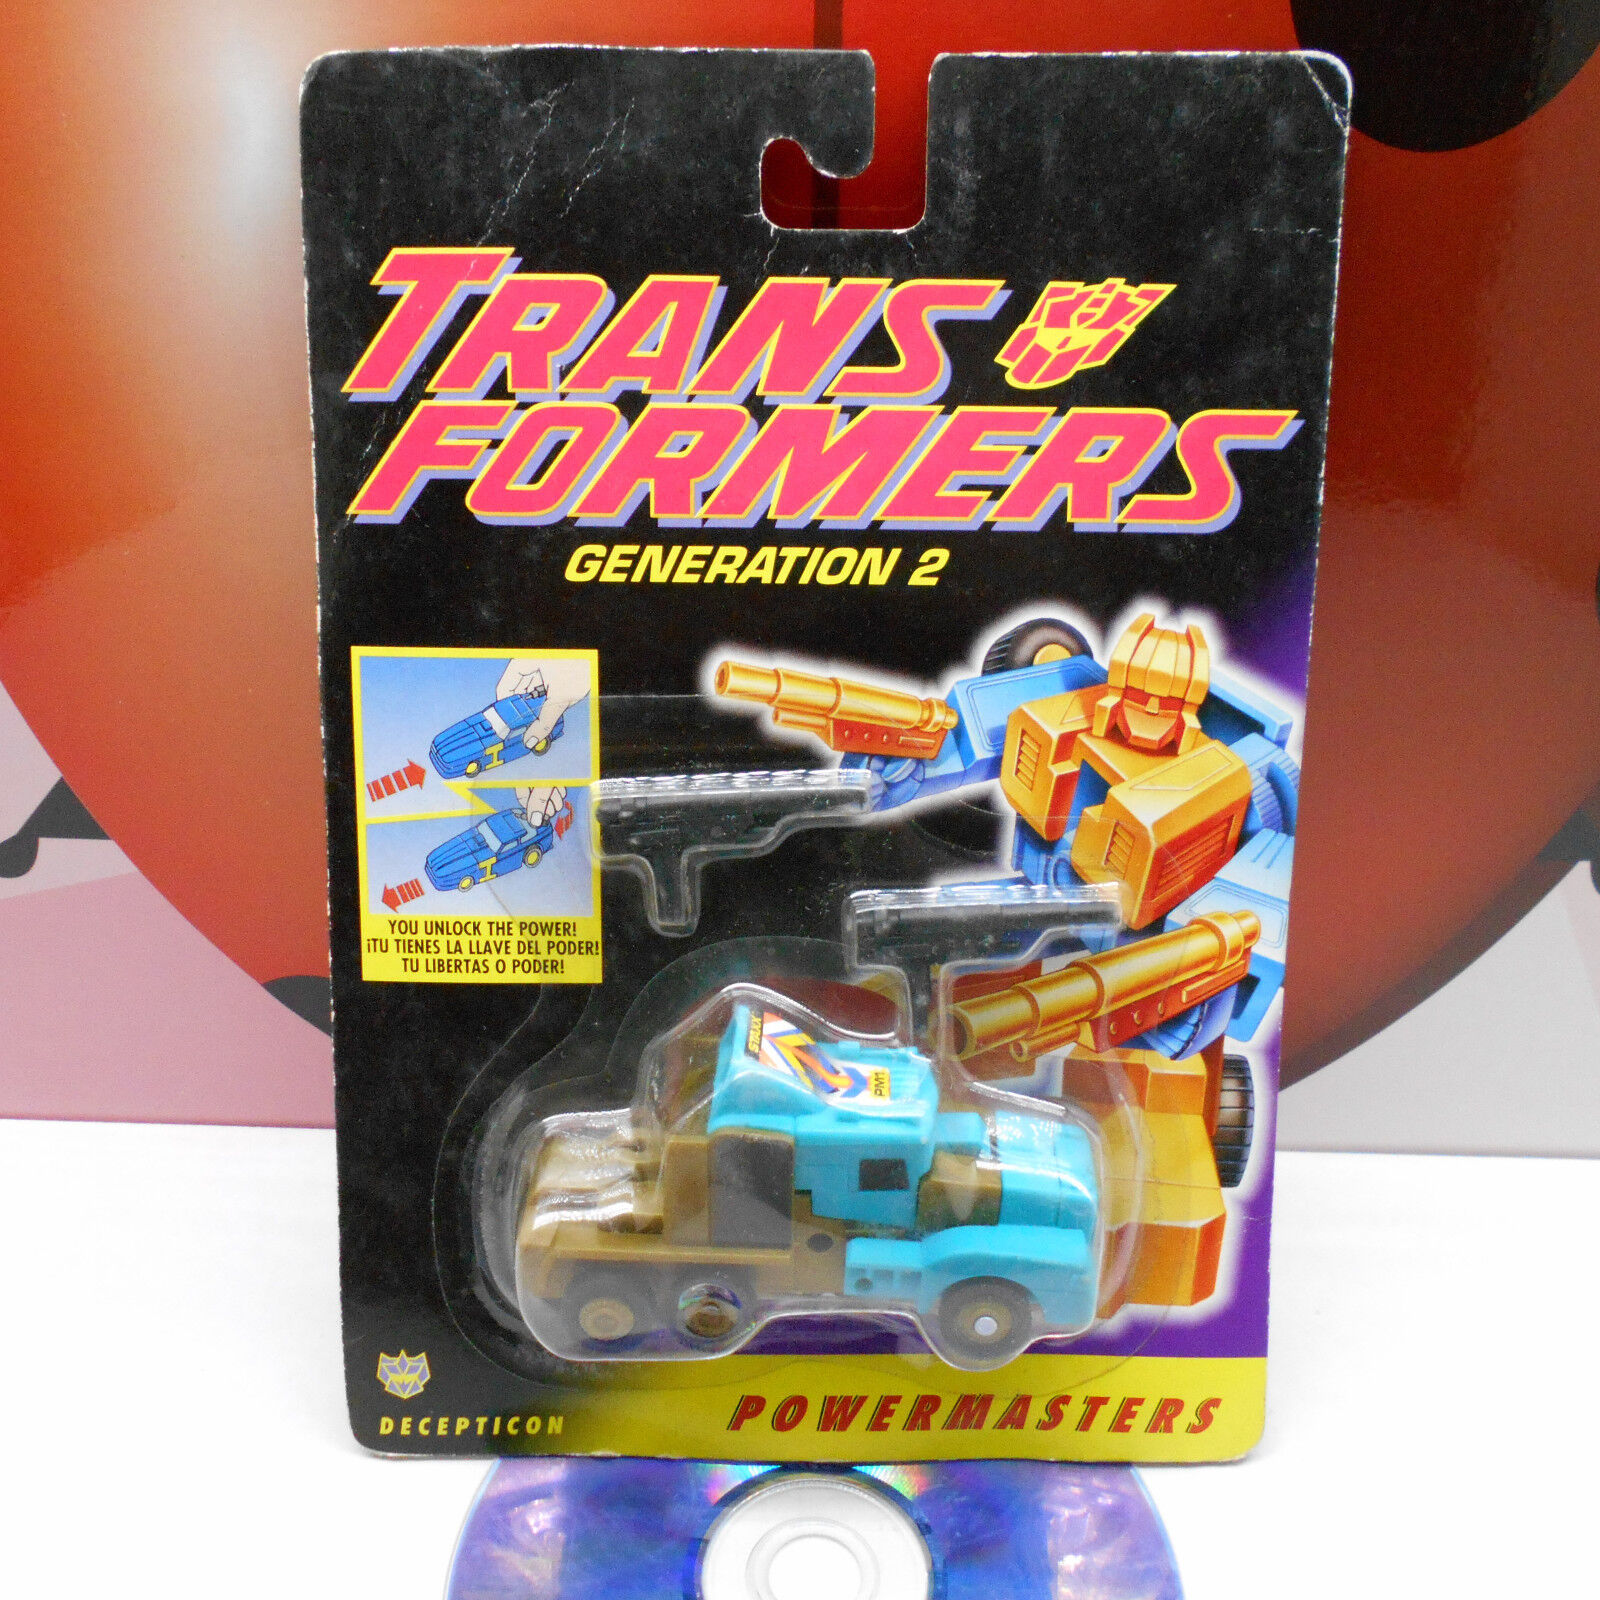 Transformers G2 Staxx powermasters Decepticon figura 1994 Hasbro Vintage Raro Ex